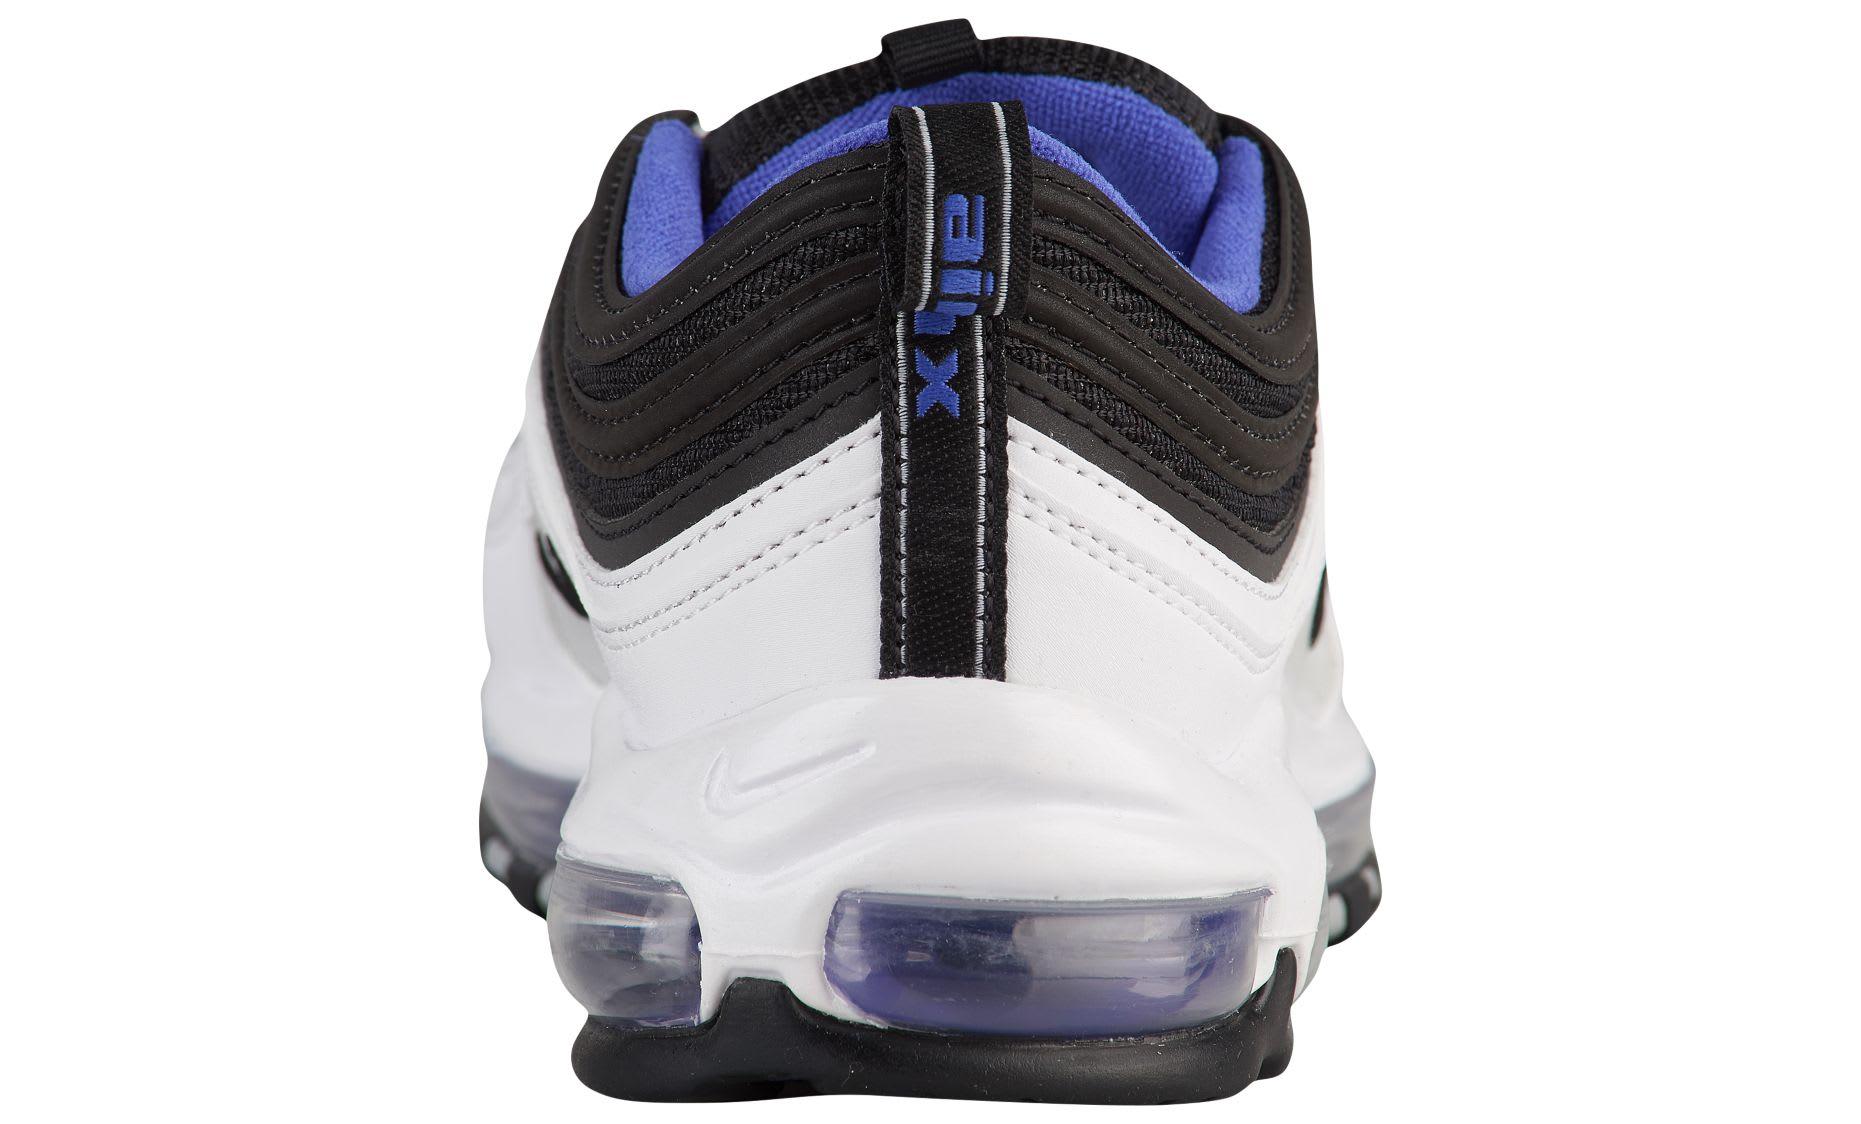 Nike Air Max 97 'White/Black/Persian Violet' 921826-103 (Heel)